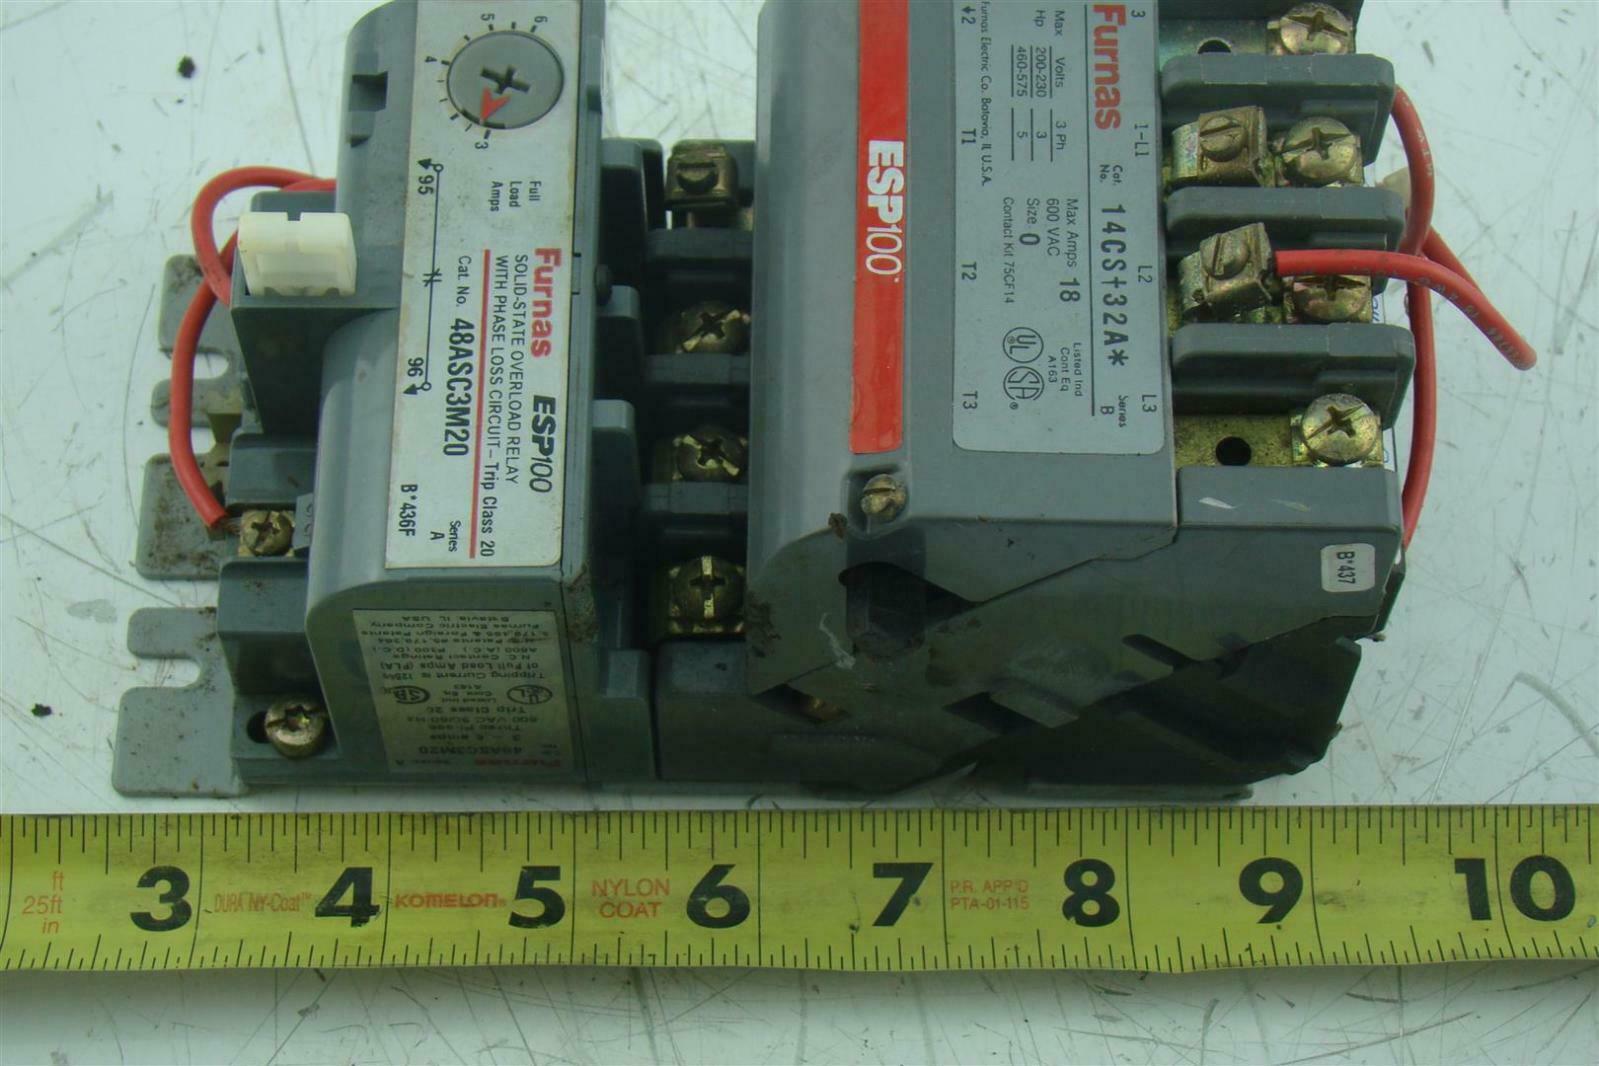 Furnas Magnetic Starter Wiring Diagram Explained Diagrams Motor Esp100 Overload Relay Schematics Air Compressor 220v